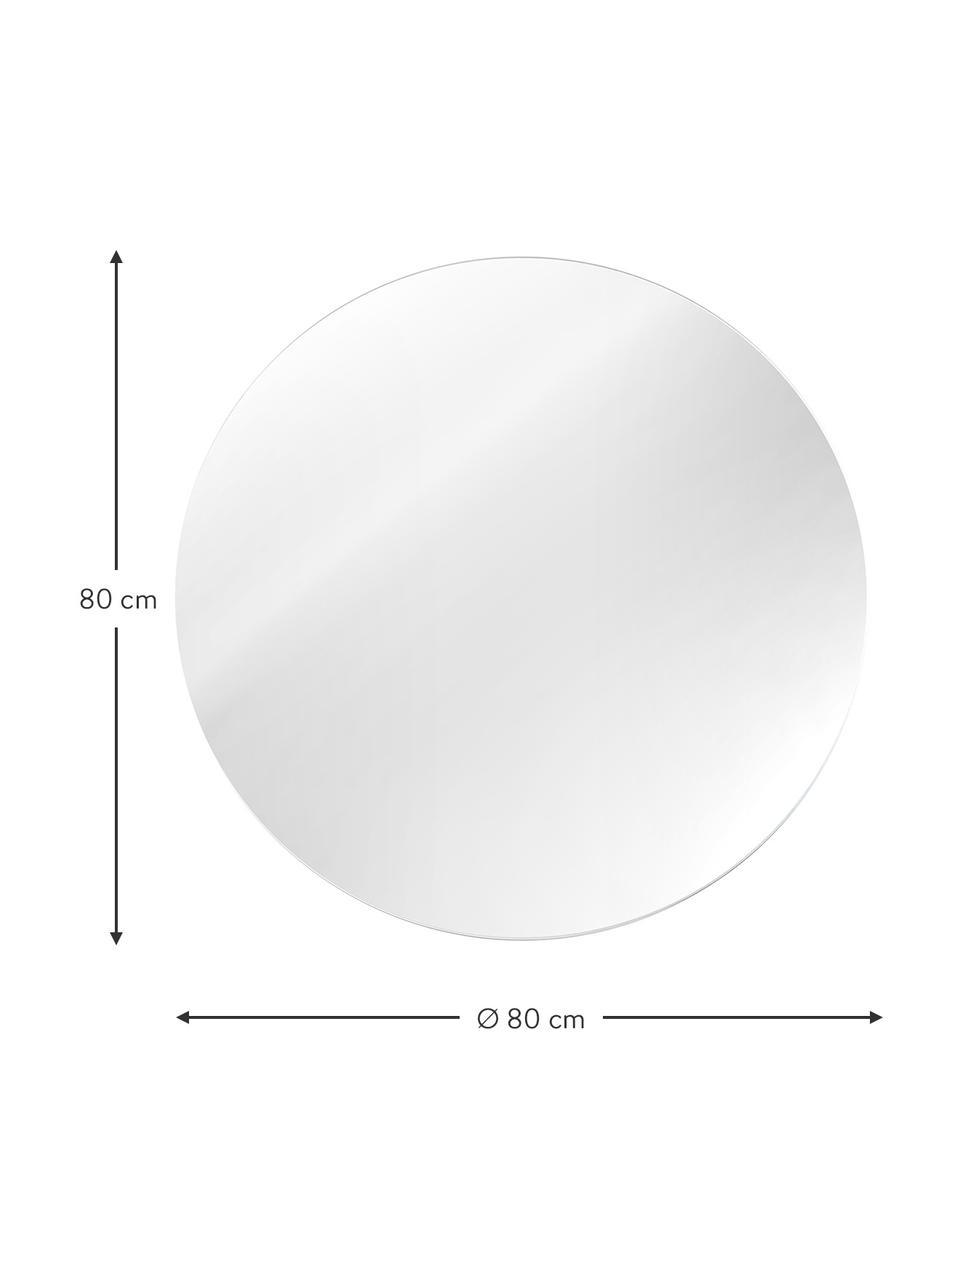 Ronde wandspiegel Erin zonder lijst, Spiegelvlak: spiegelglas. Buitenrand: zwart, Ø 100 cm